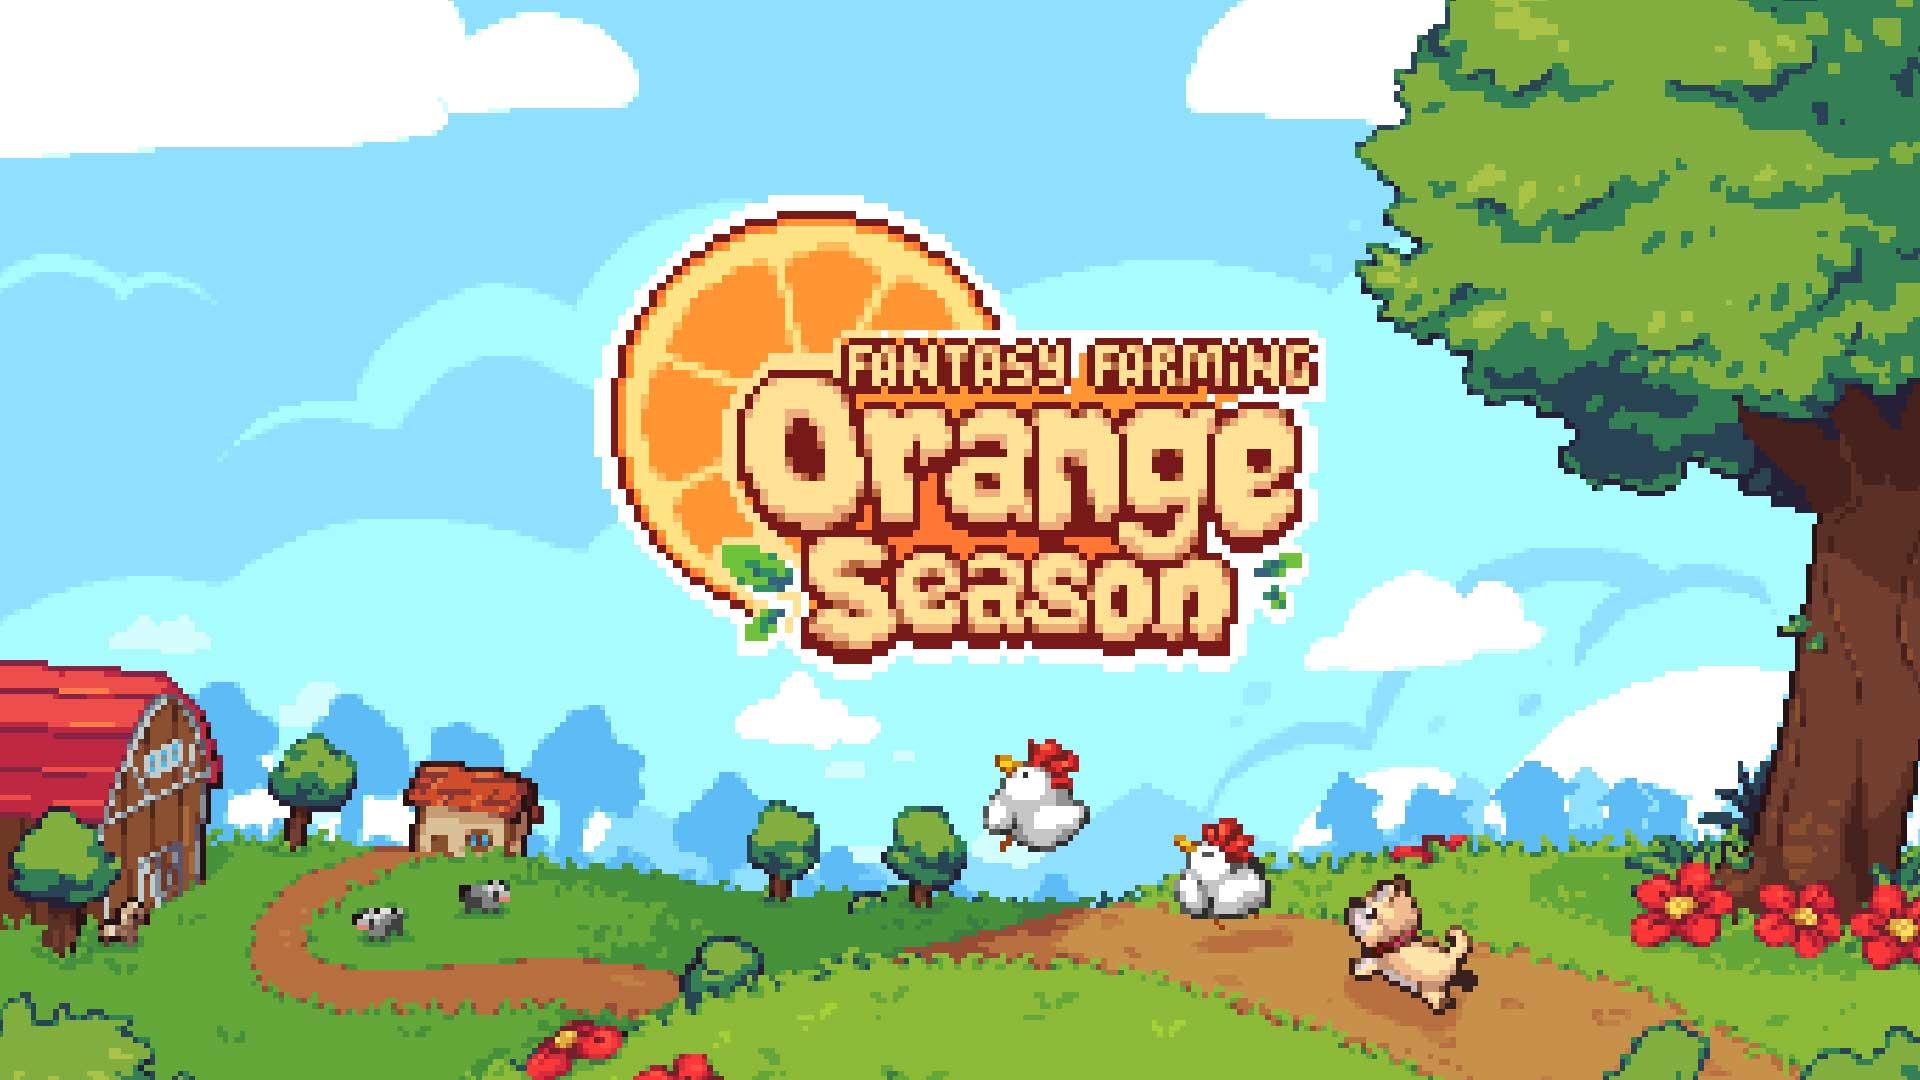 Fantasy Farming Banner